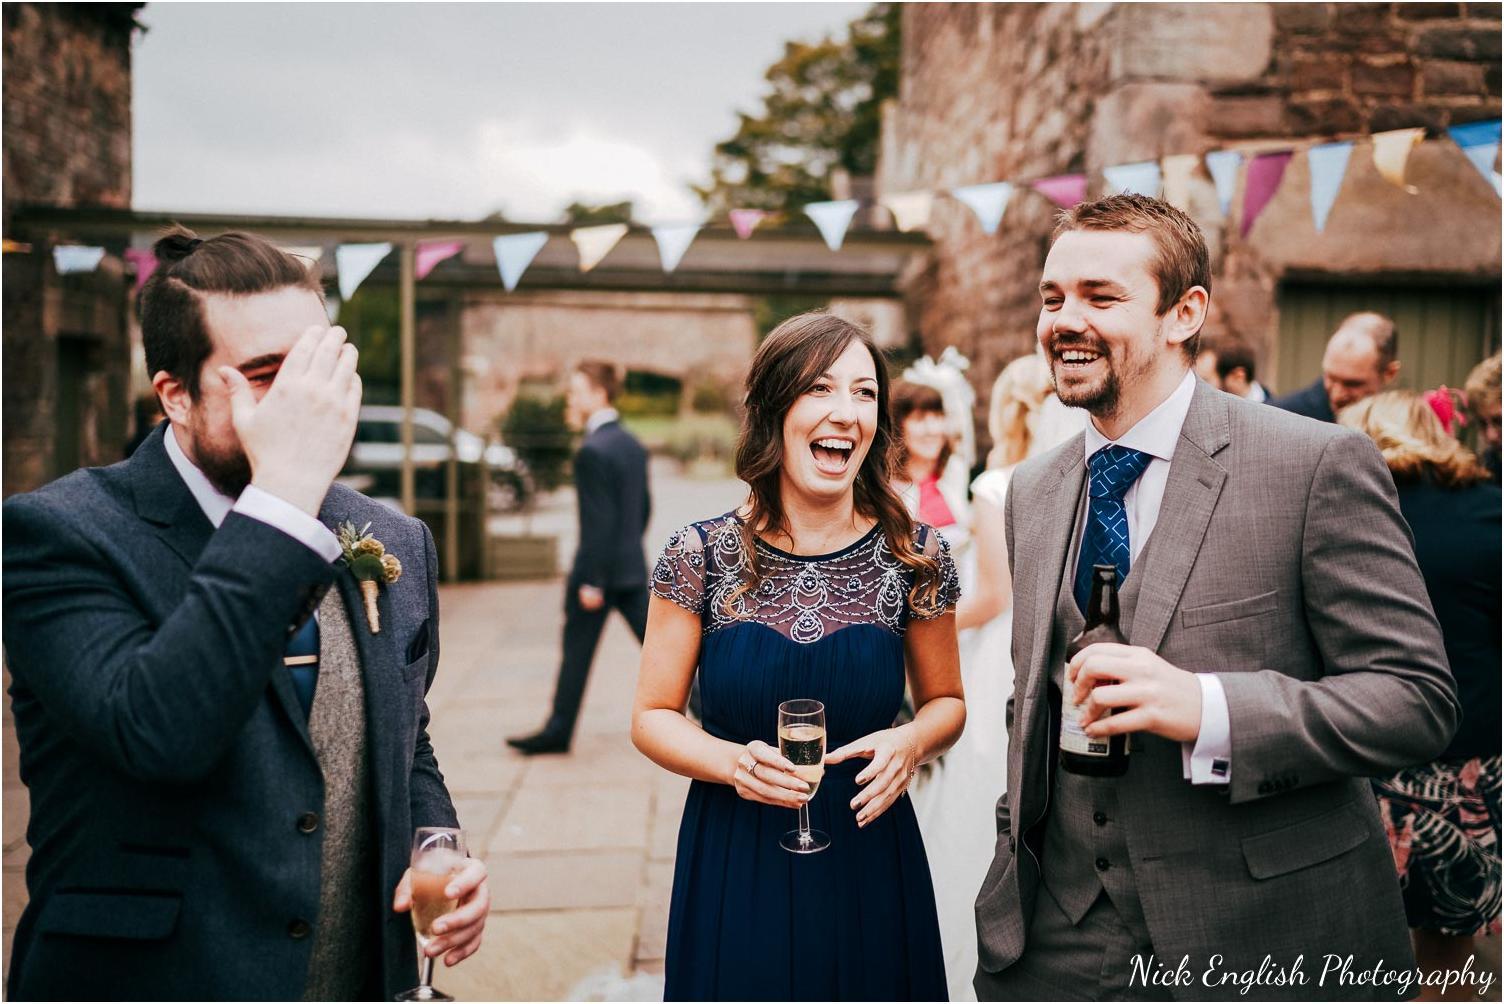 The_Ashes_Barn_Endon_Stoke_Wedding_Photographer-50.jpg